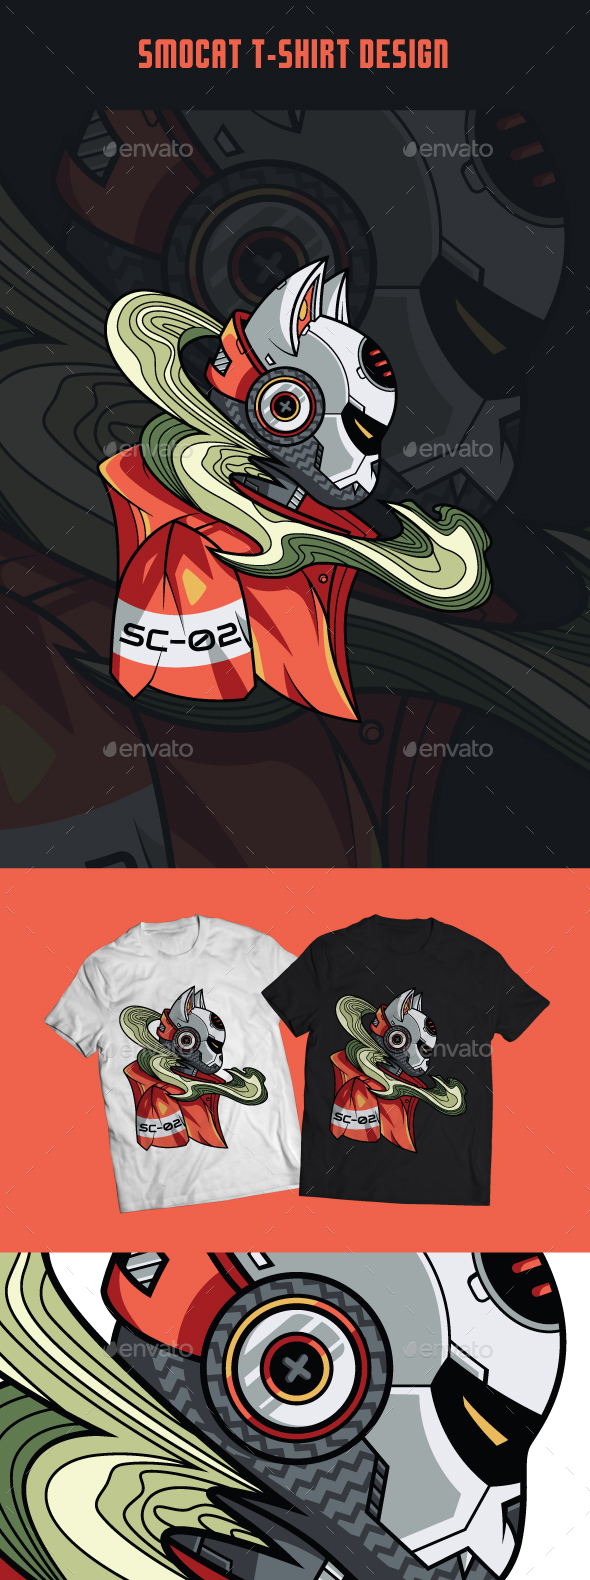 Smocat T-Shirt Design